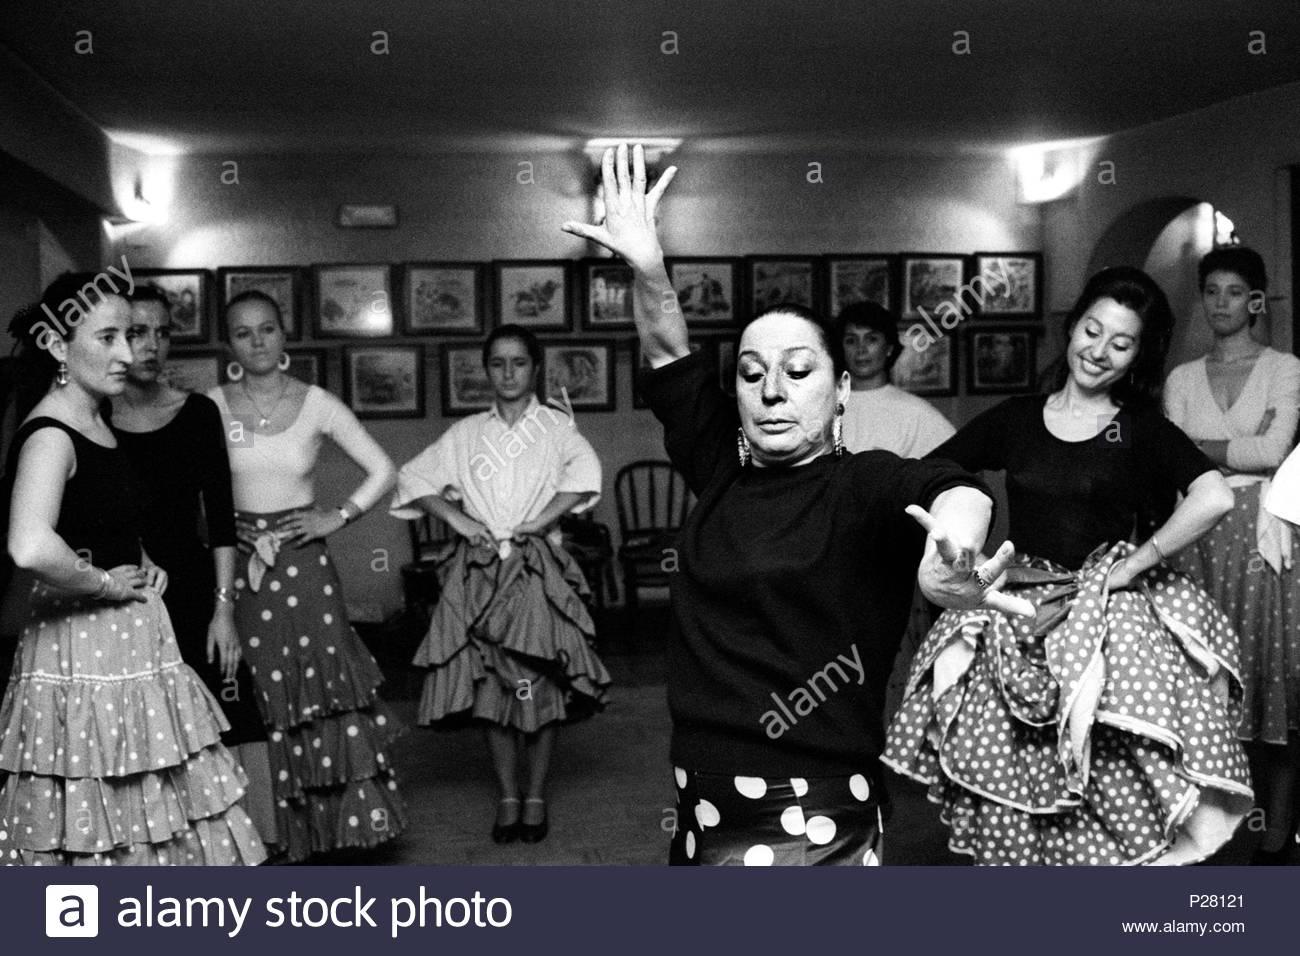 Lucia albaicin flamenco tänzerin